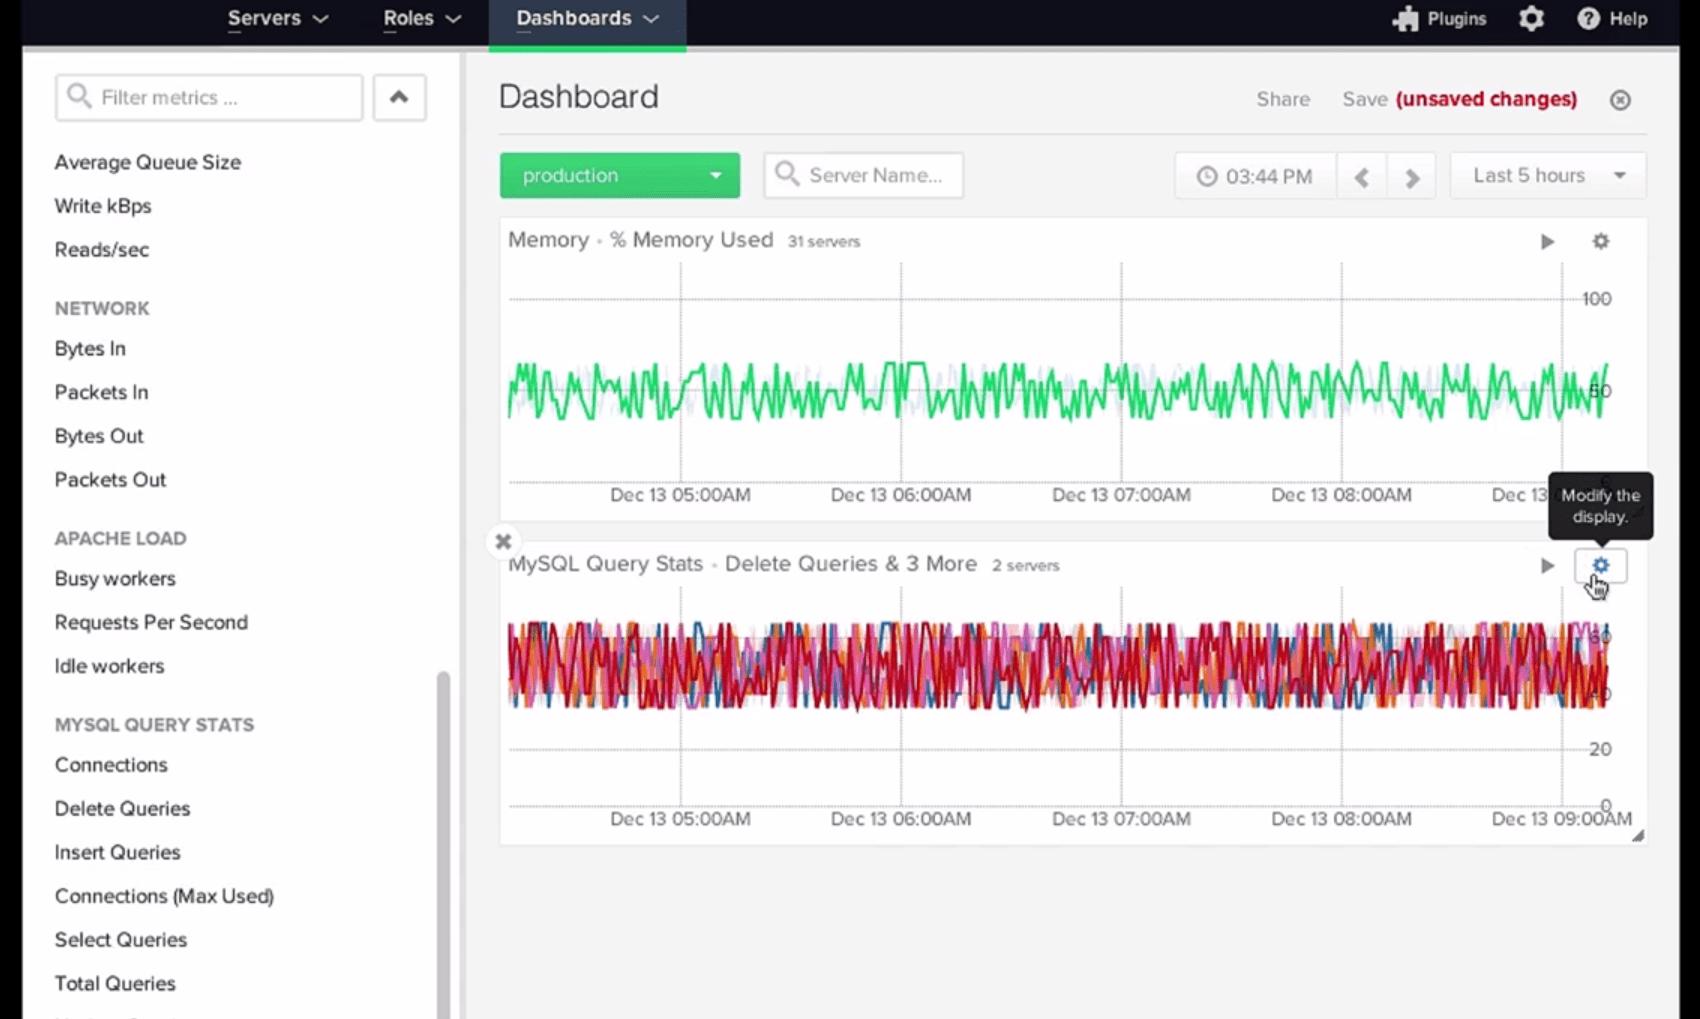 pingdom server monitoring